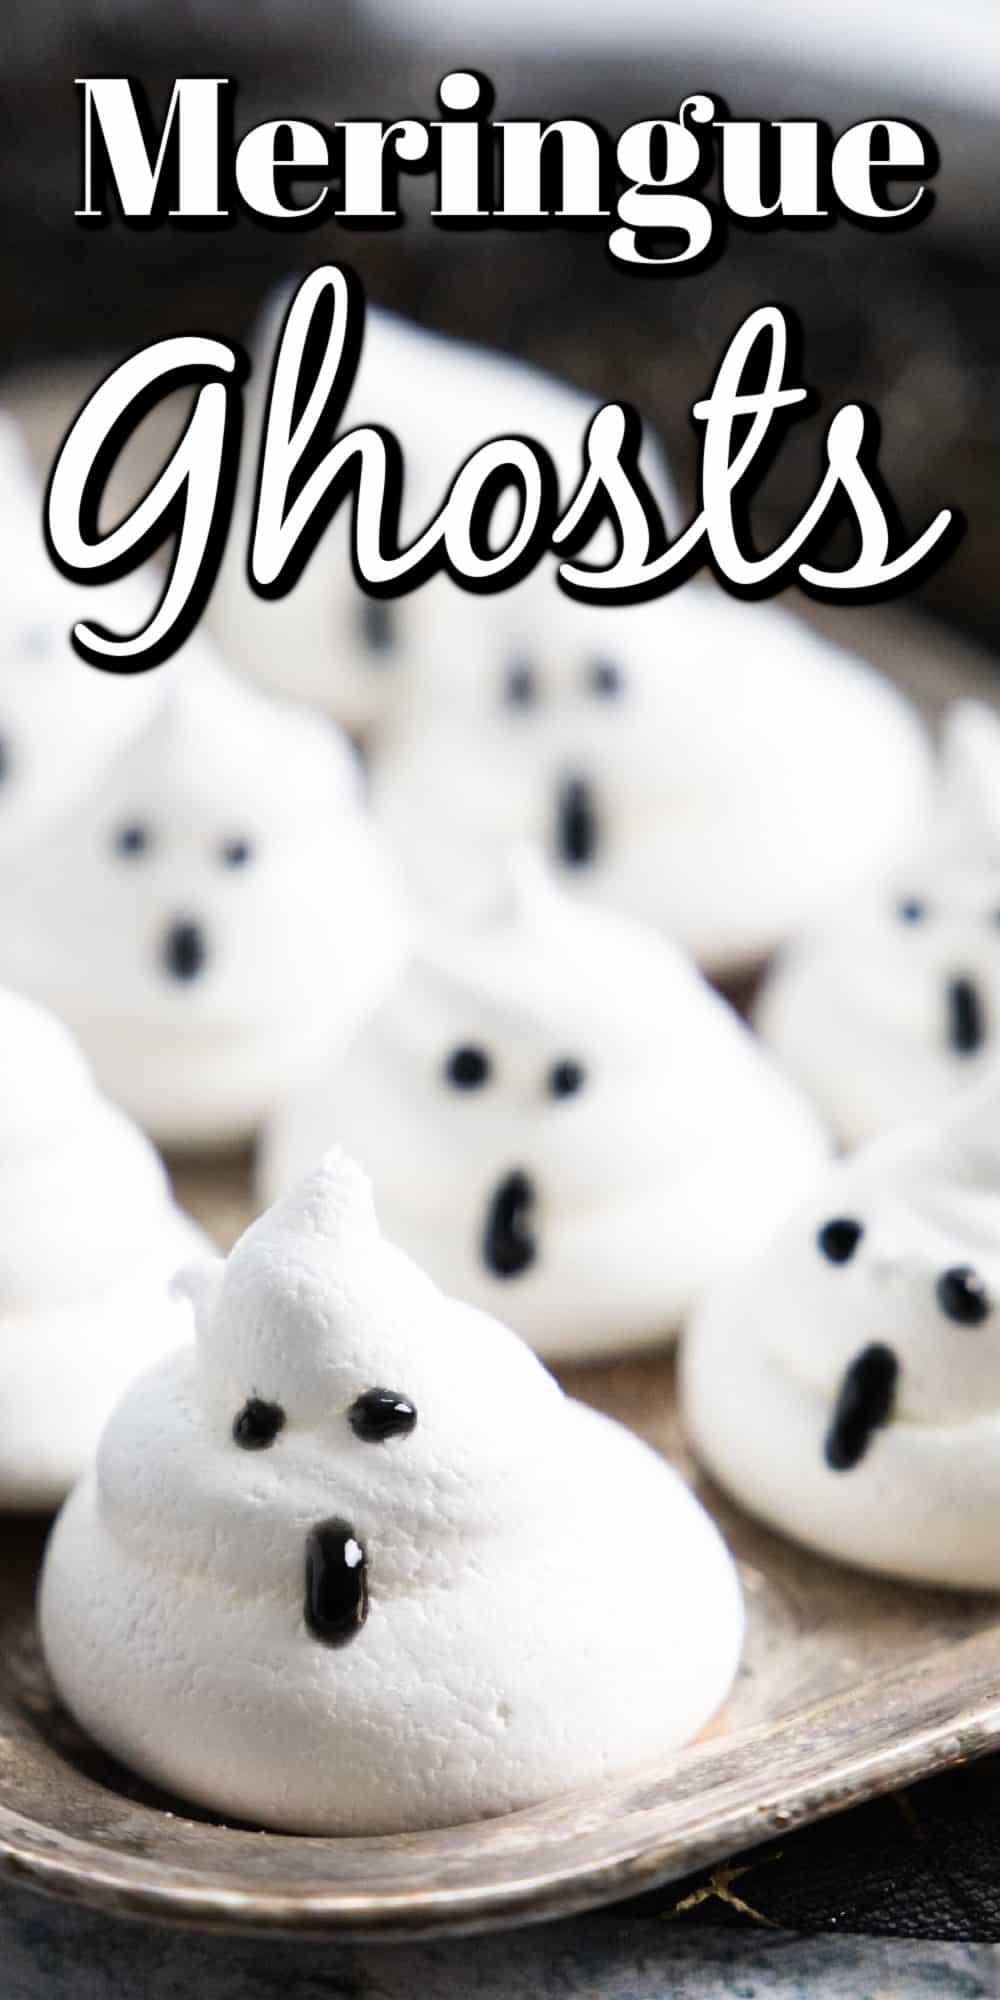 Meringue Ghosts Pin